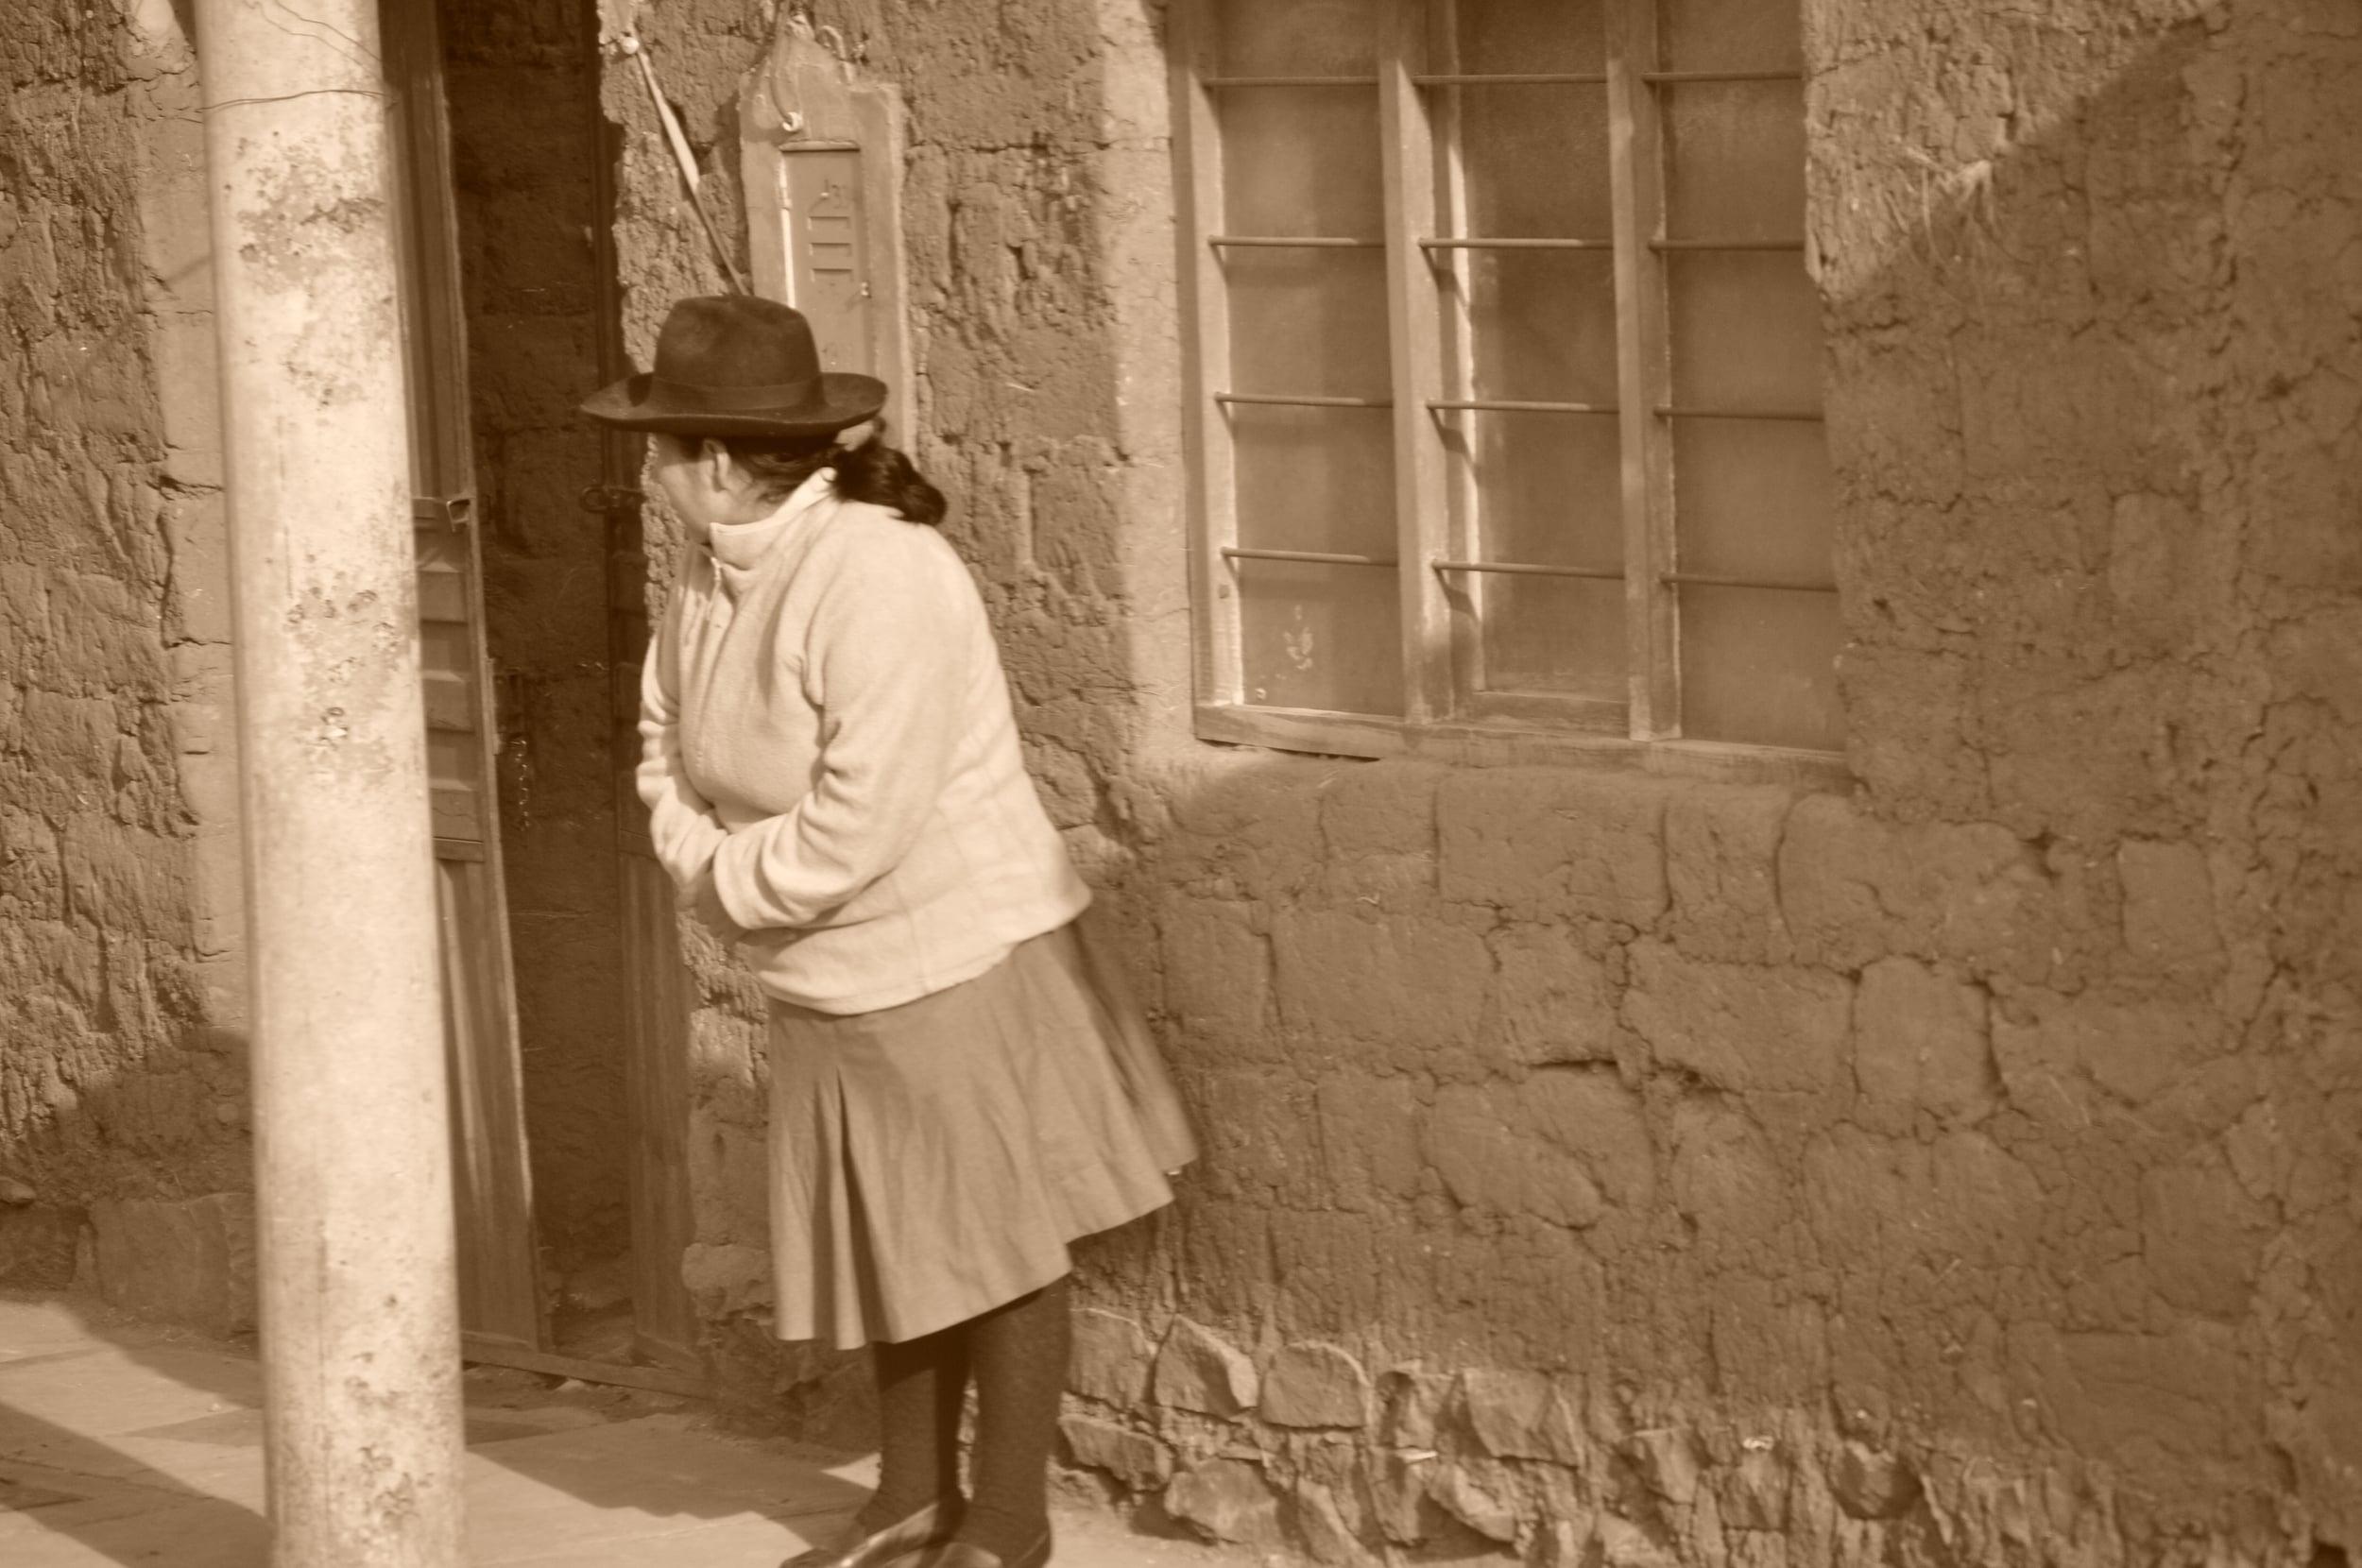 Her waiting. Photo: Pamy Rojas